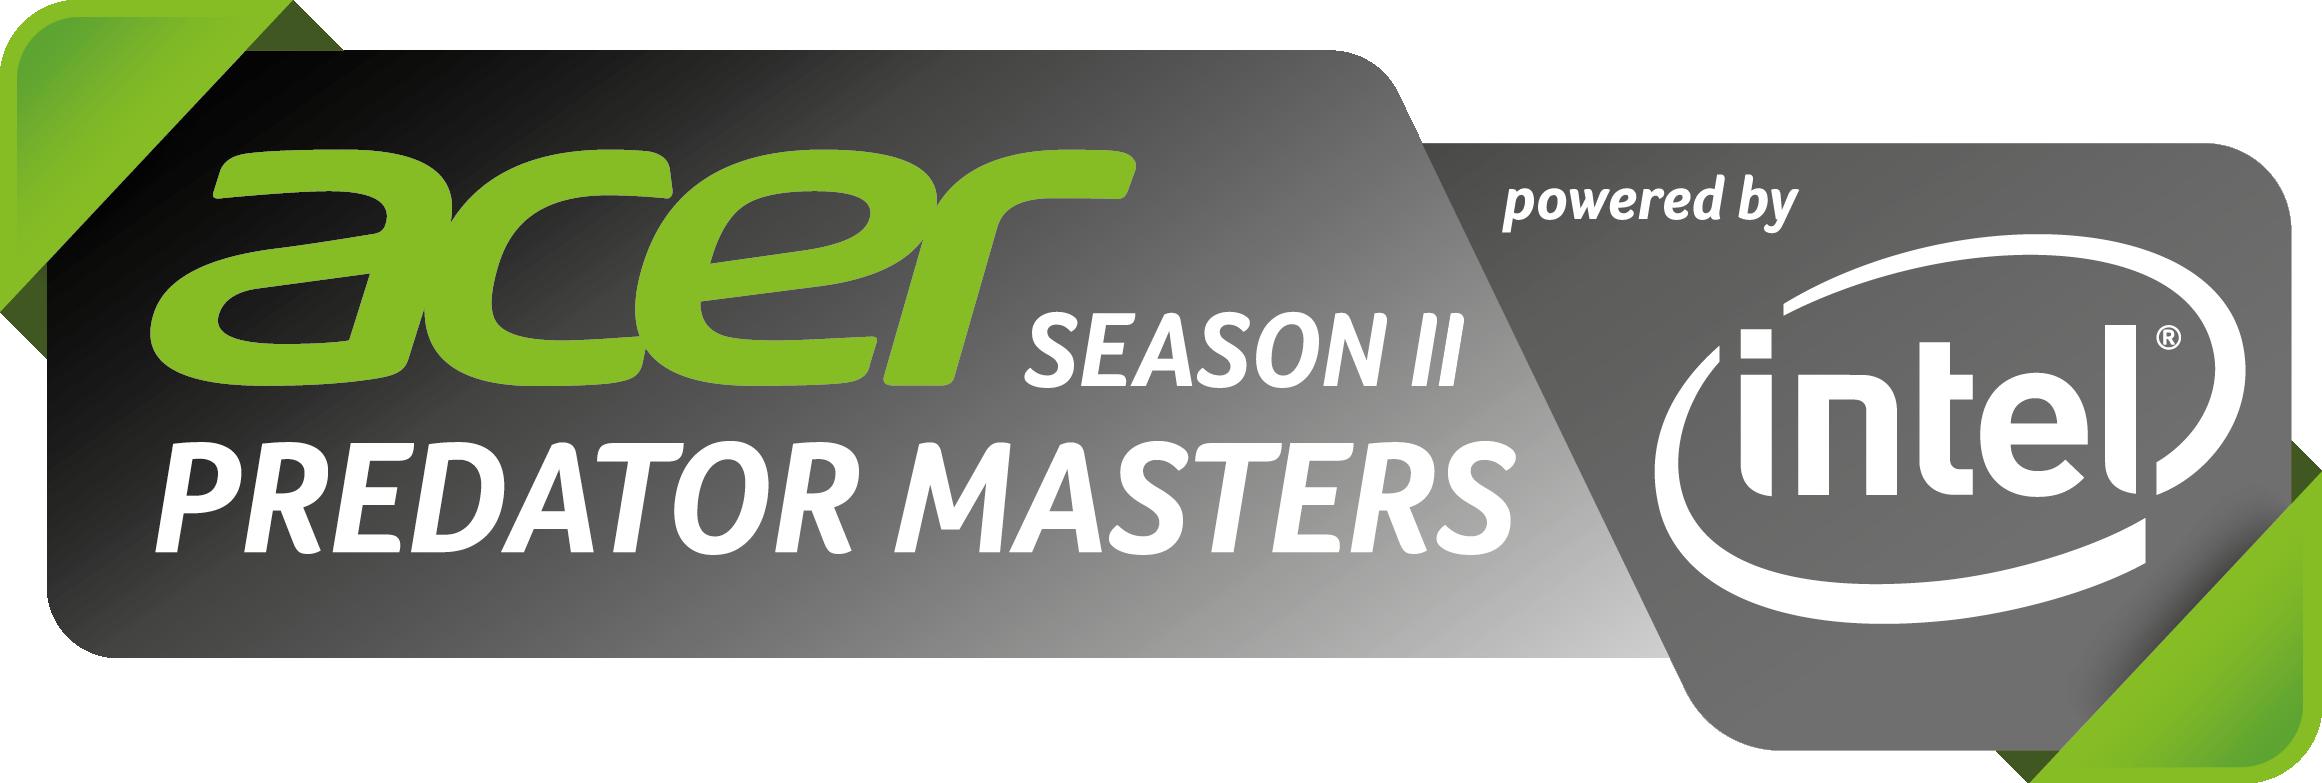 acer_predator_masters_july2015